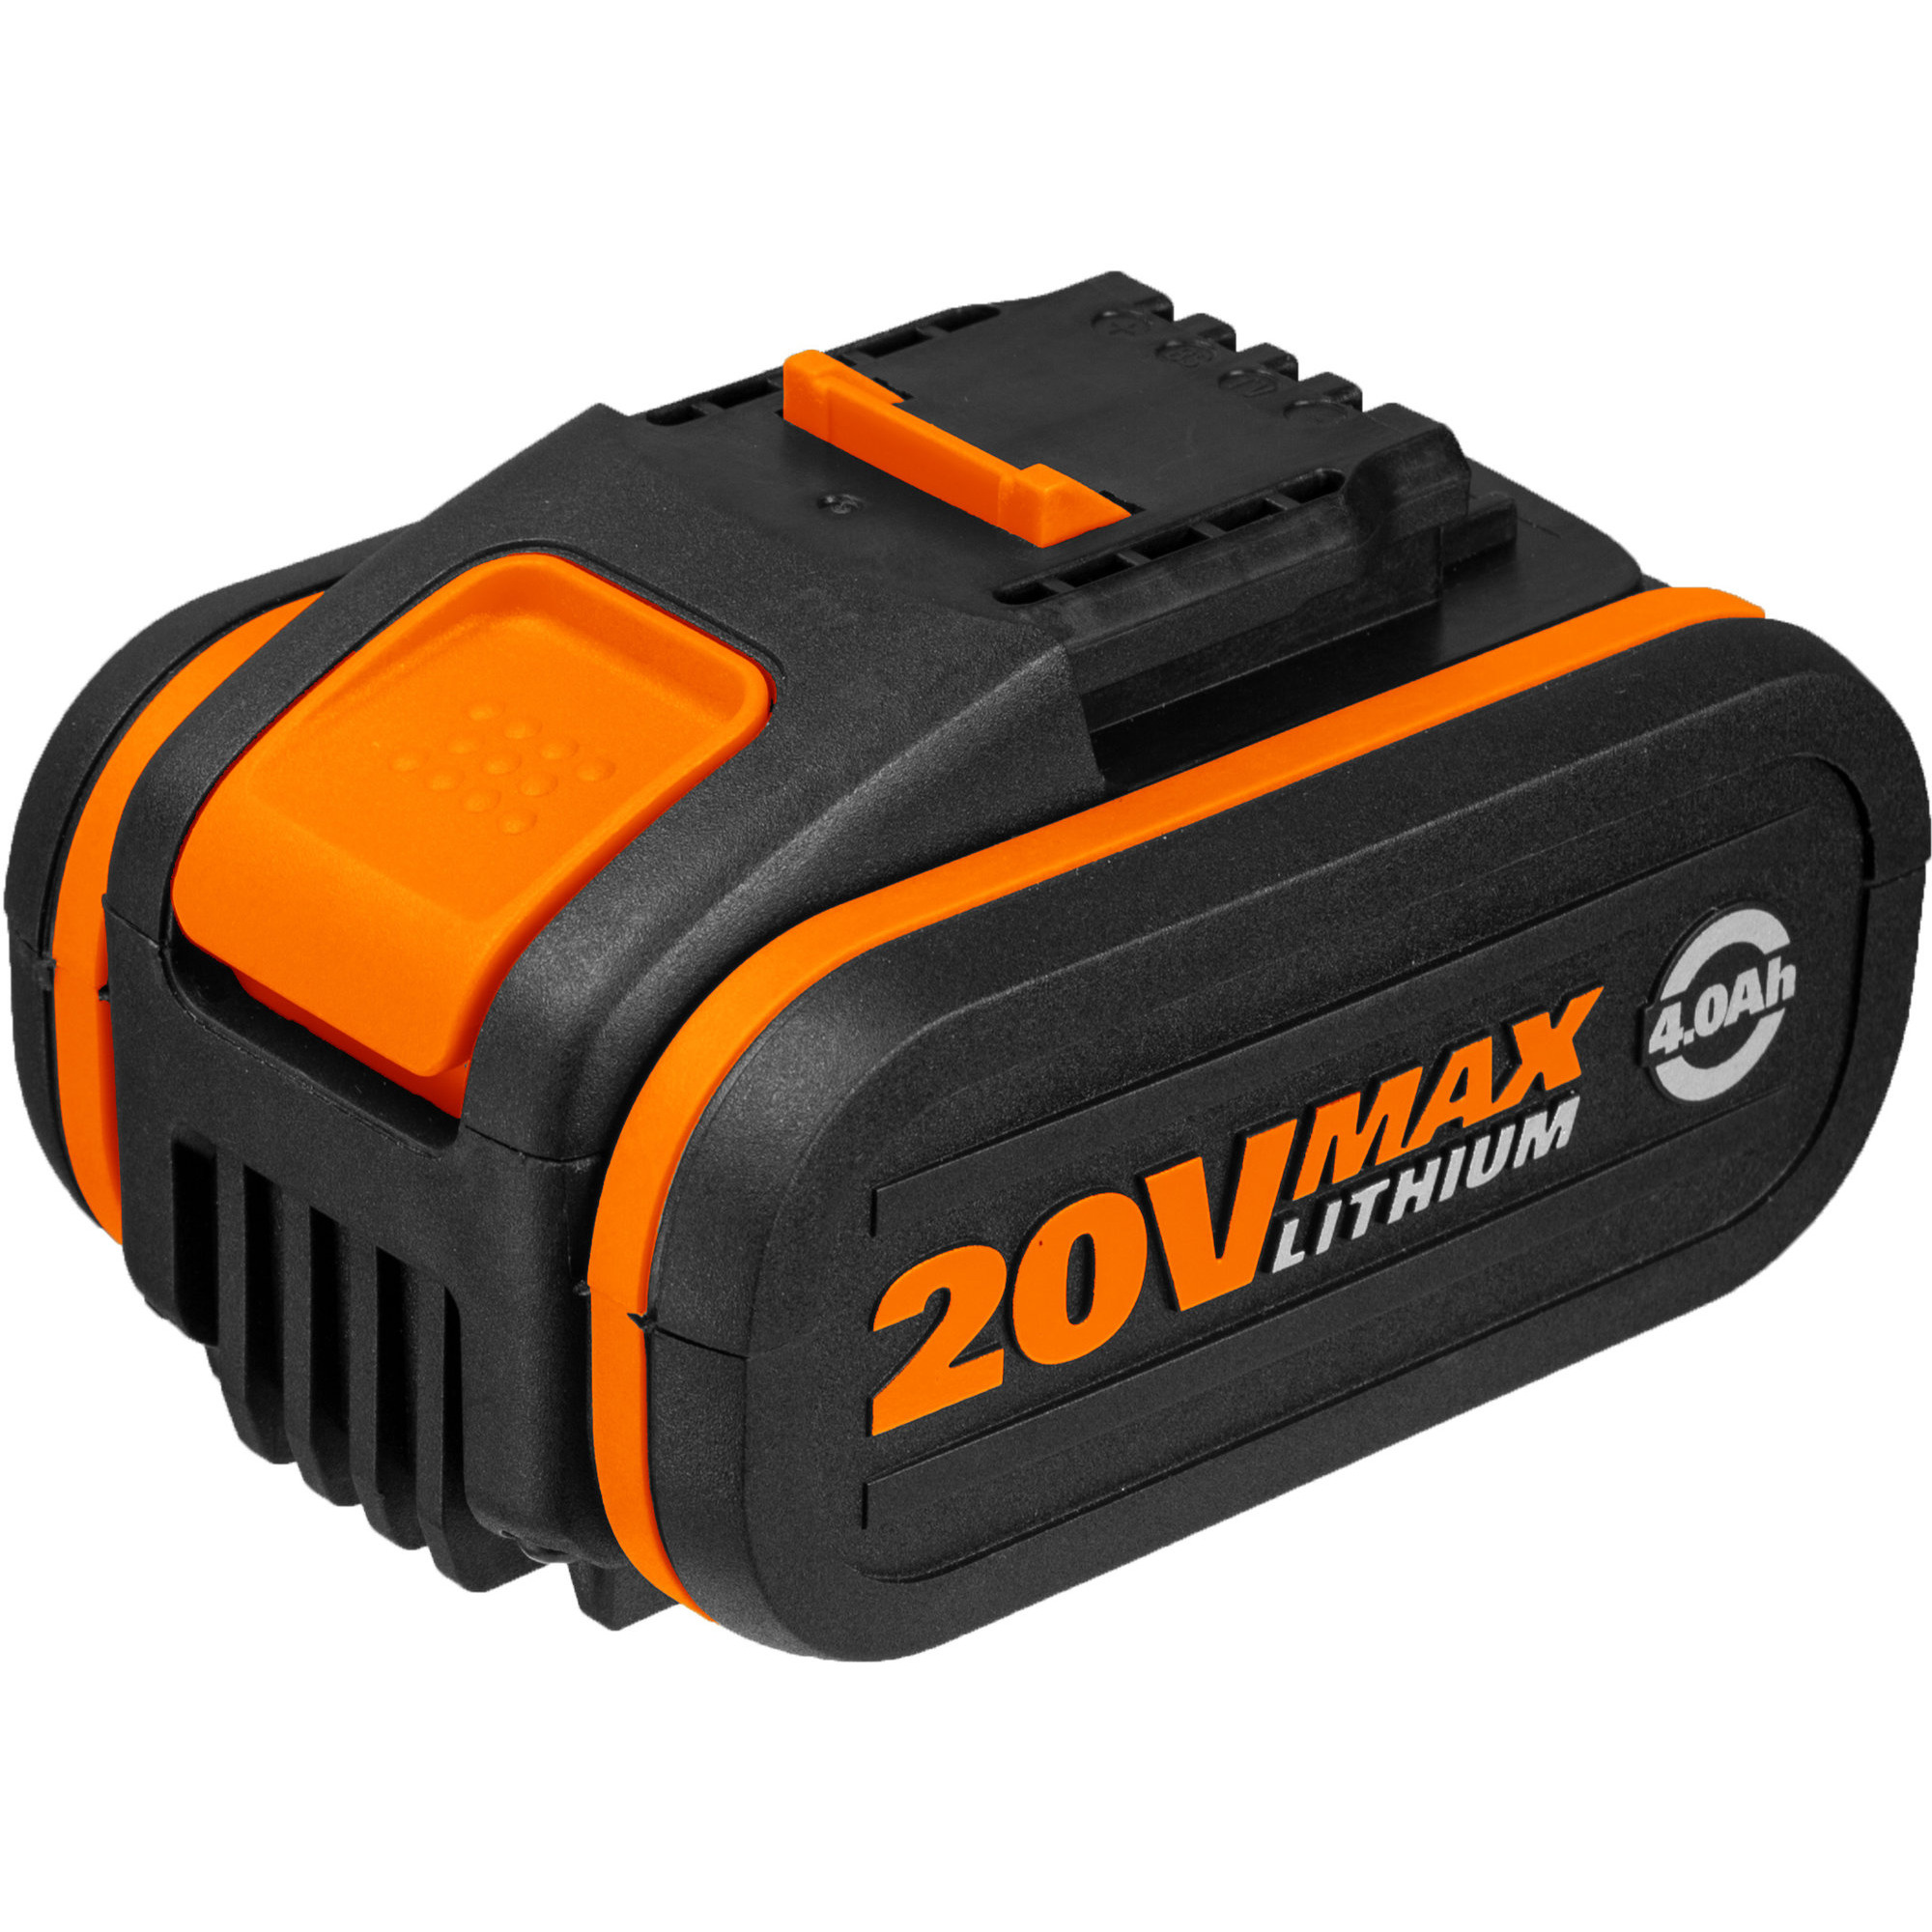 Worx WA3553 20V 4.0Ah-batteri med indikator